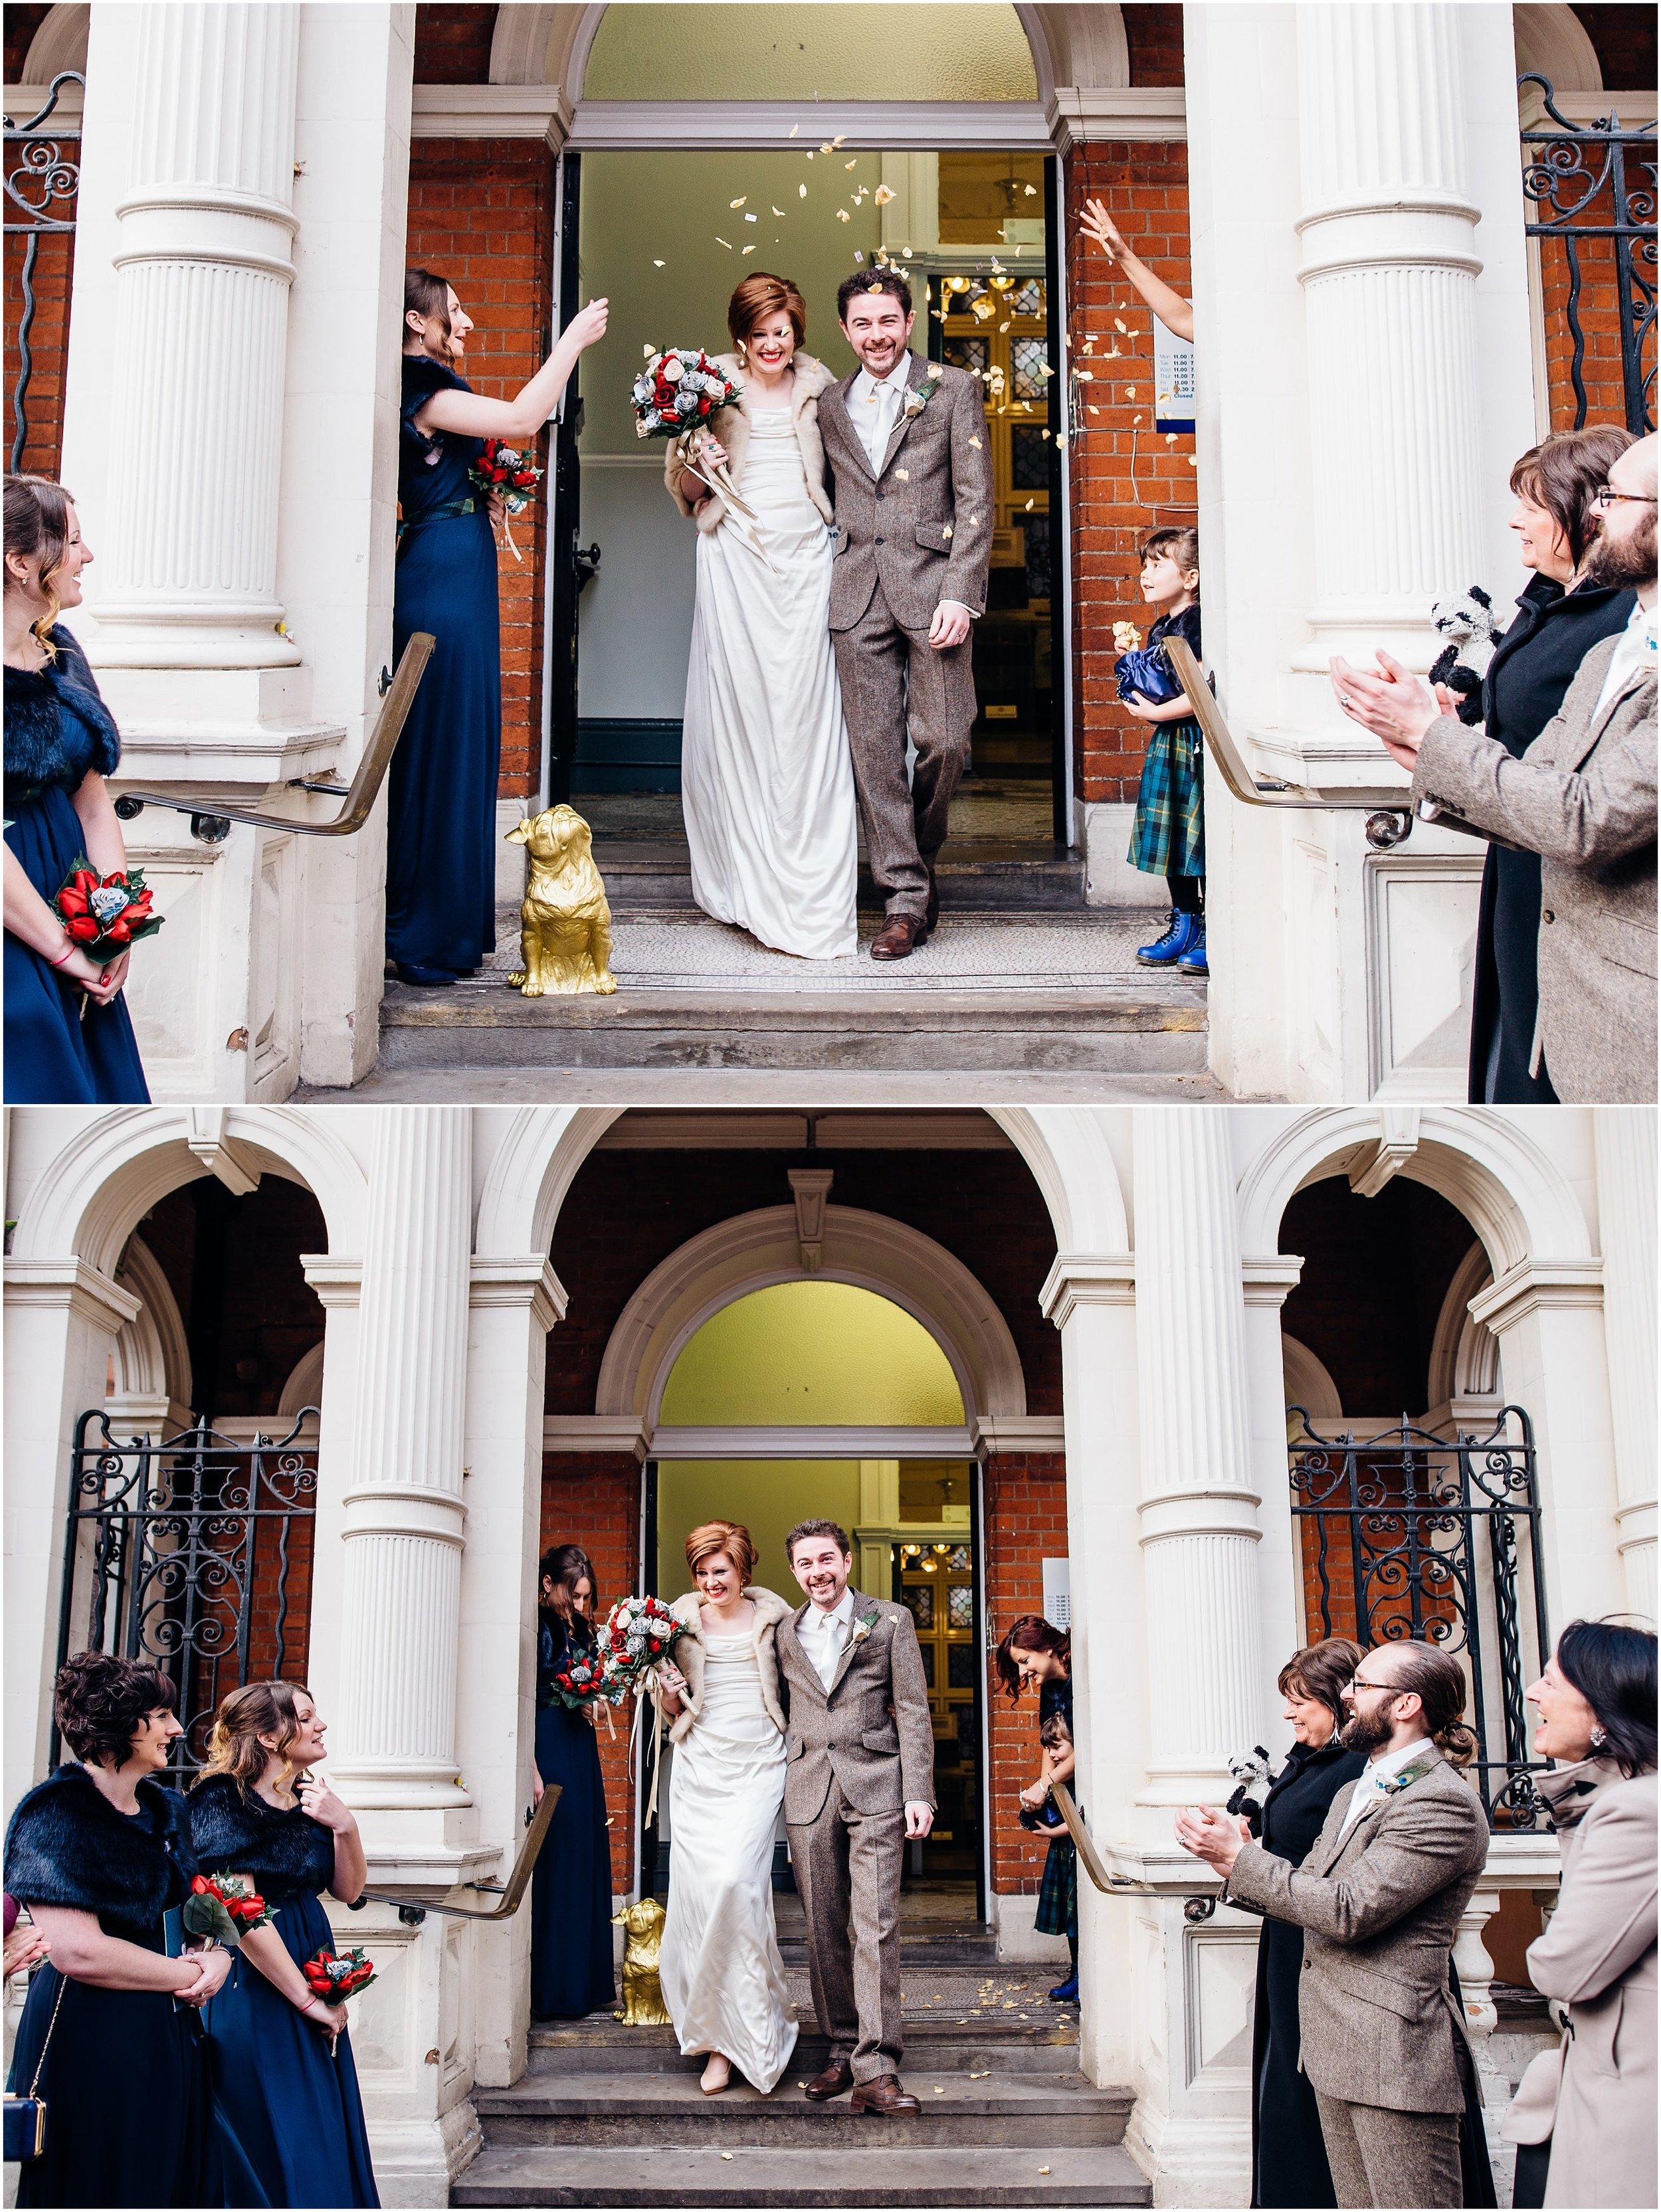 Bloomsbury Bowling london wedding photographer_0035.jpg